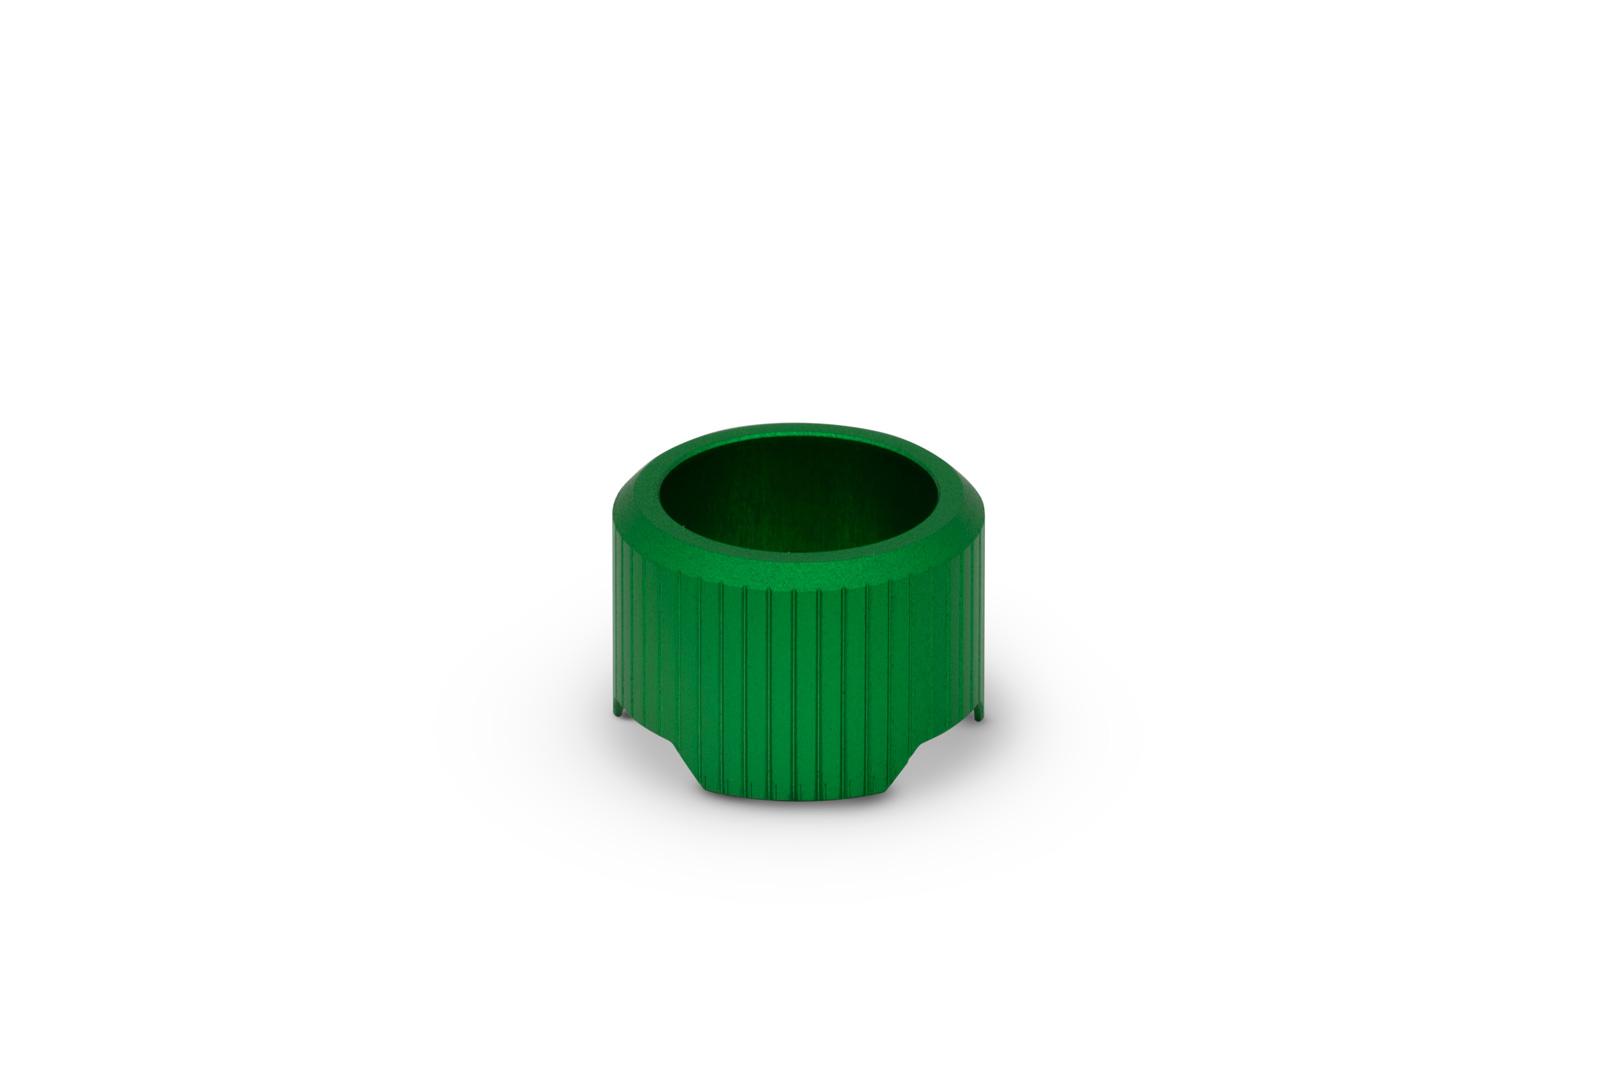 EK-Quantum_Torque_Compression_Ring_6-Pack_STC_16-Green_TOP